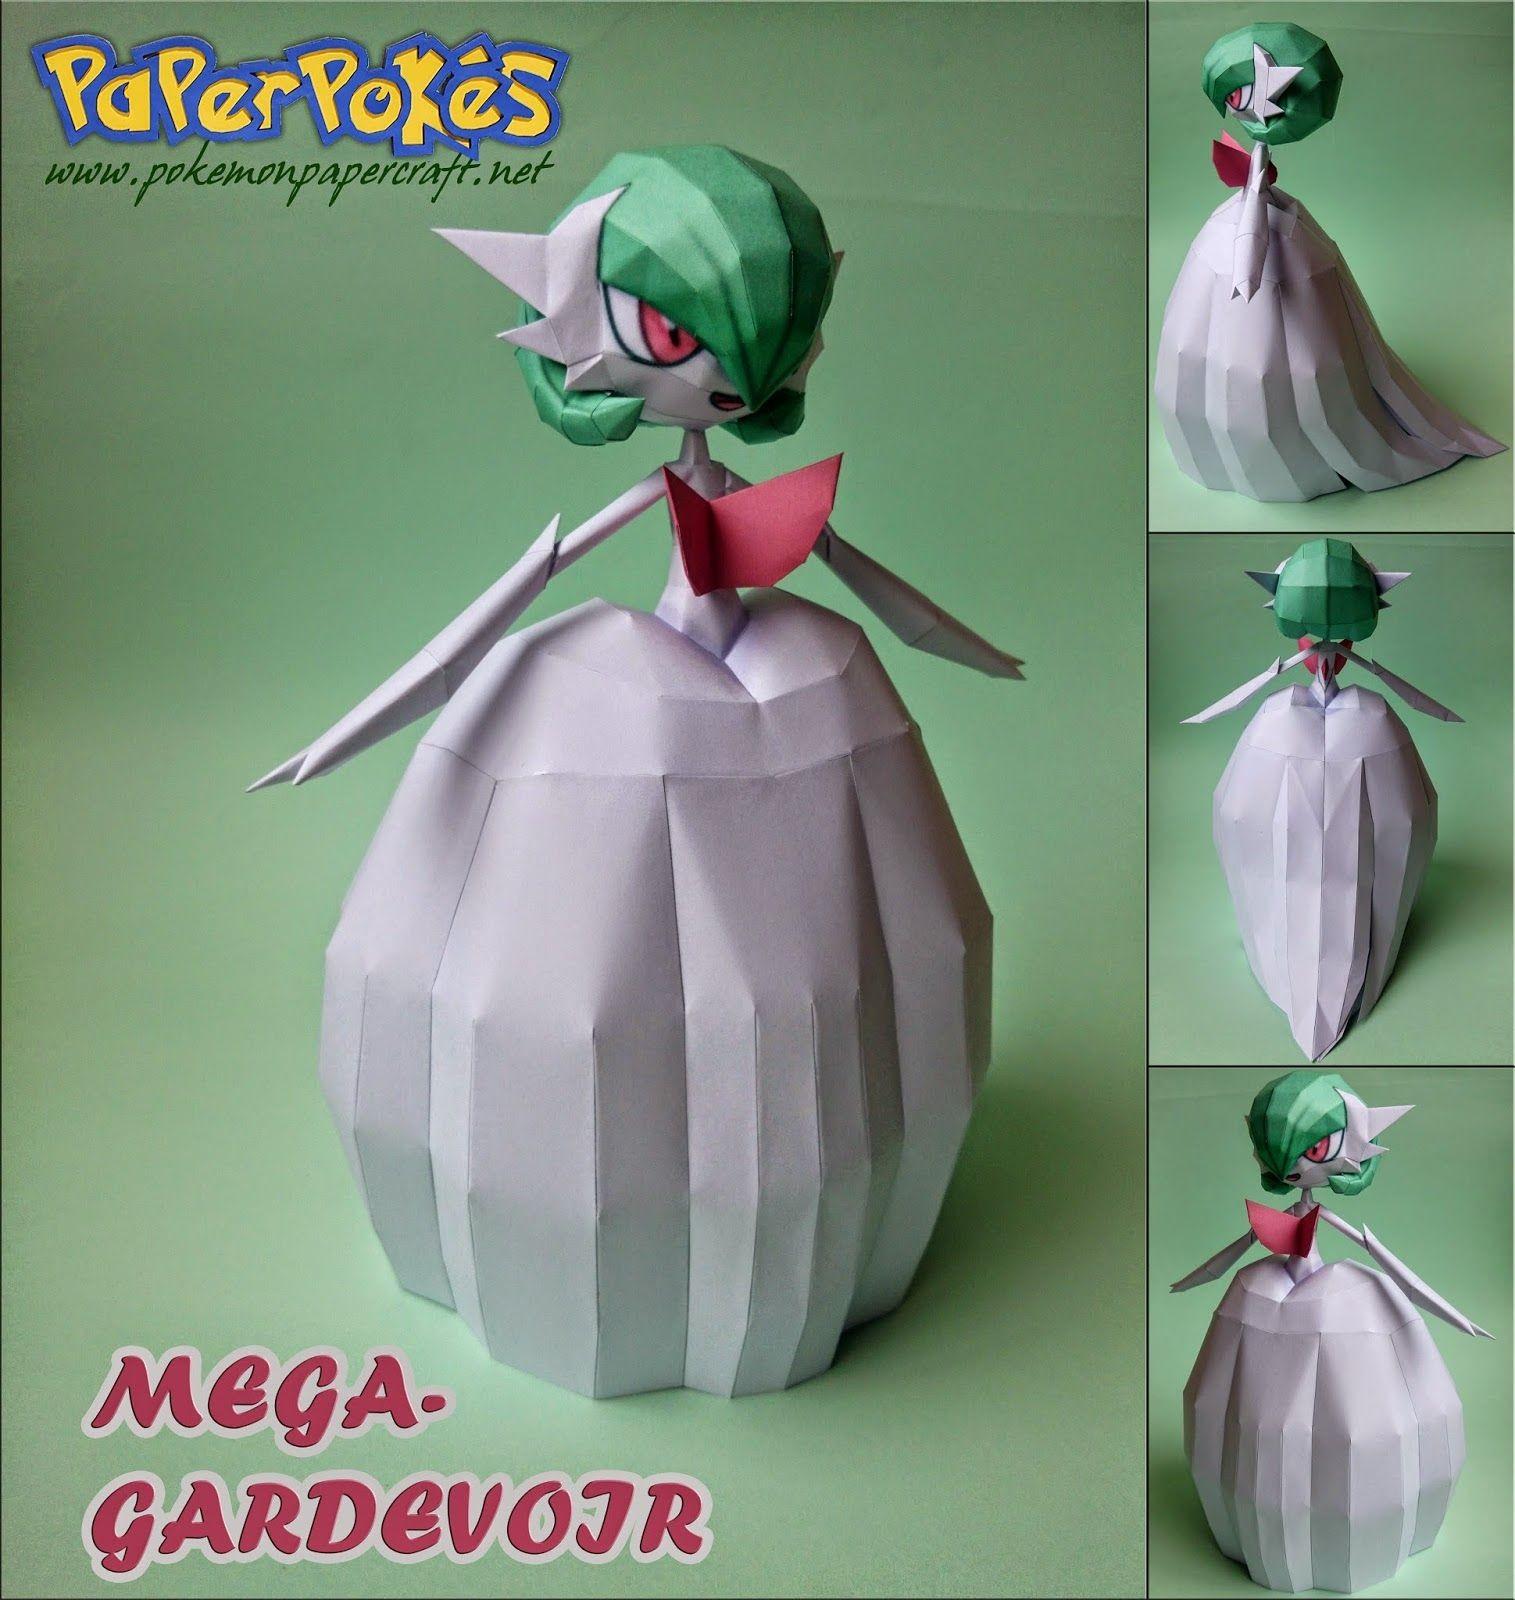 3d Model to Papercraft Paperpokés Pokémon Papercrafts Mega Gardevoir